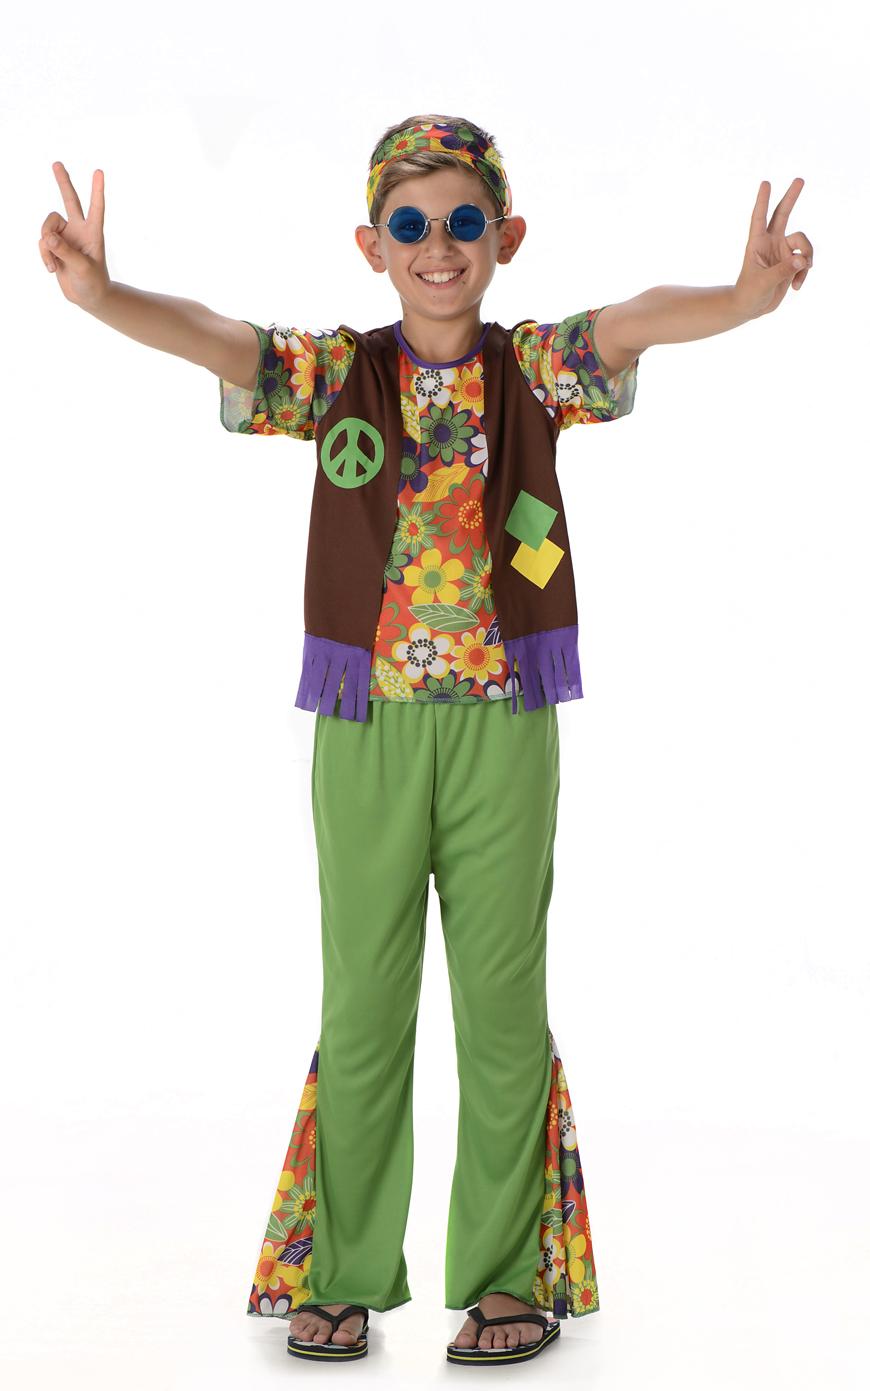 Child HIPPIE DUDE 1960s Medallion Boys Fancy Dress Hippy Kids Costume Age 5-13